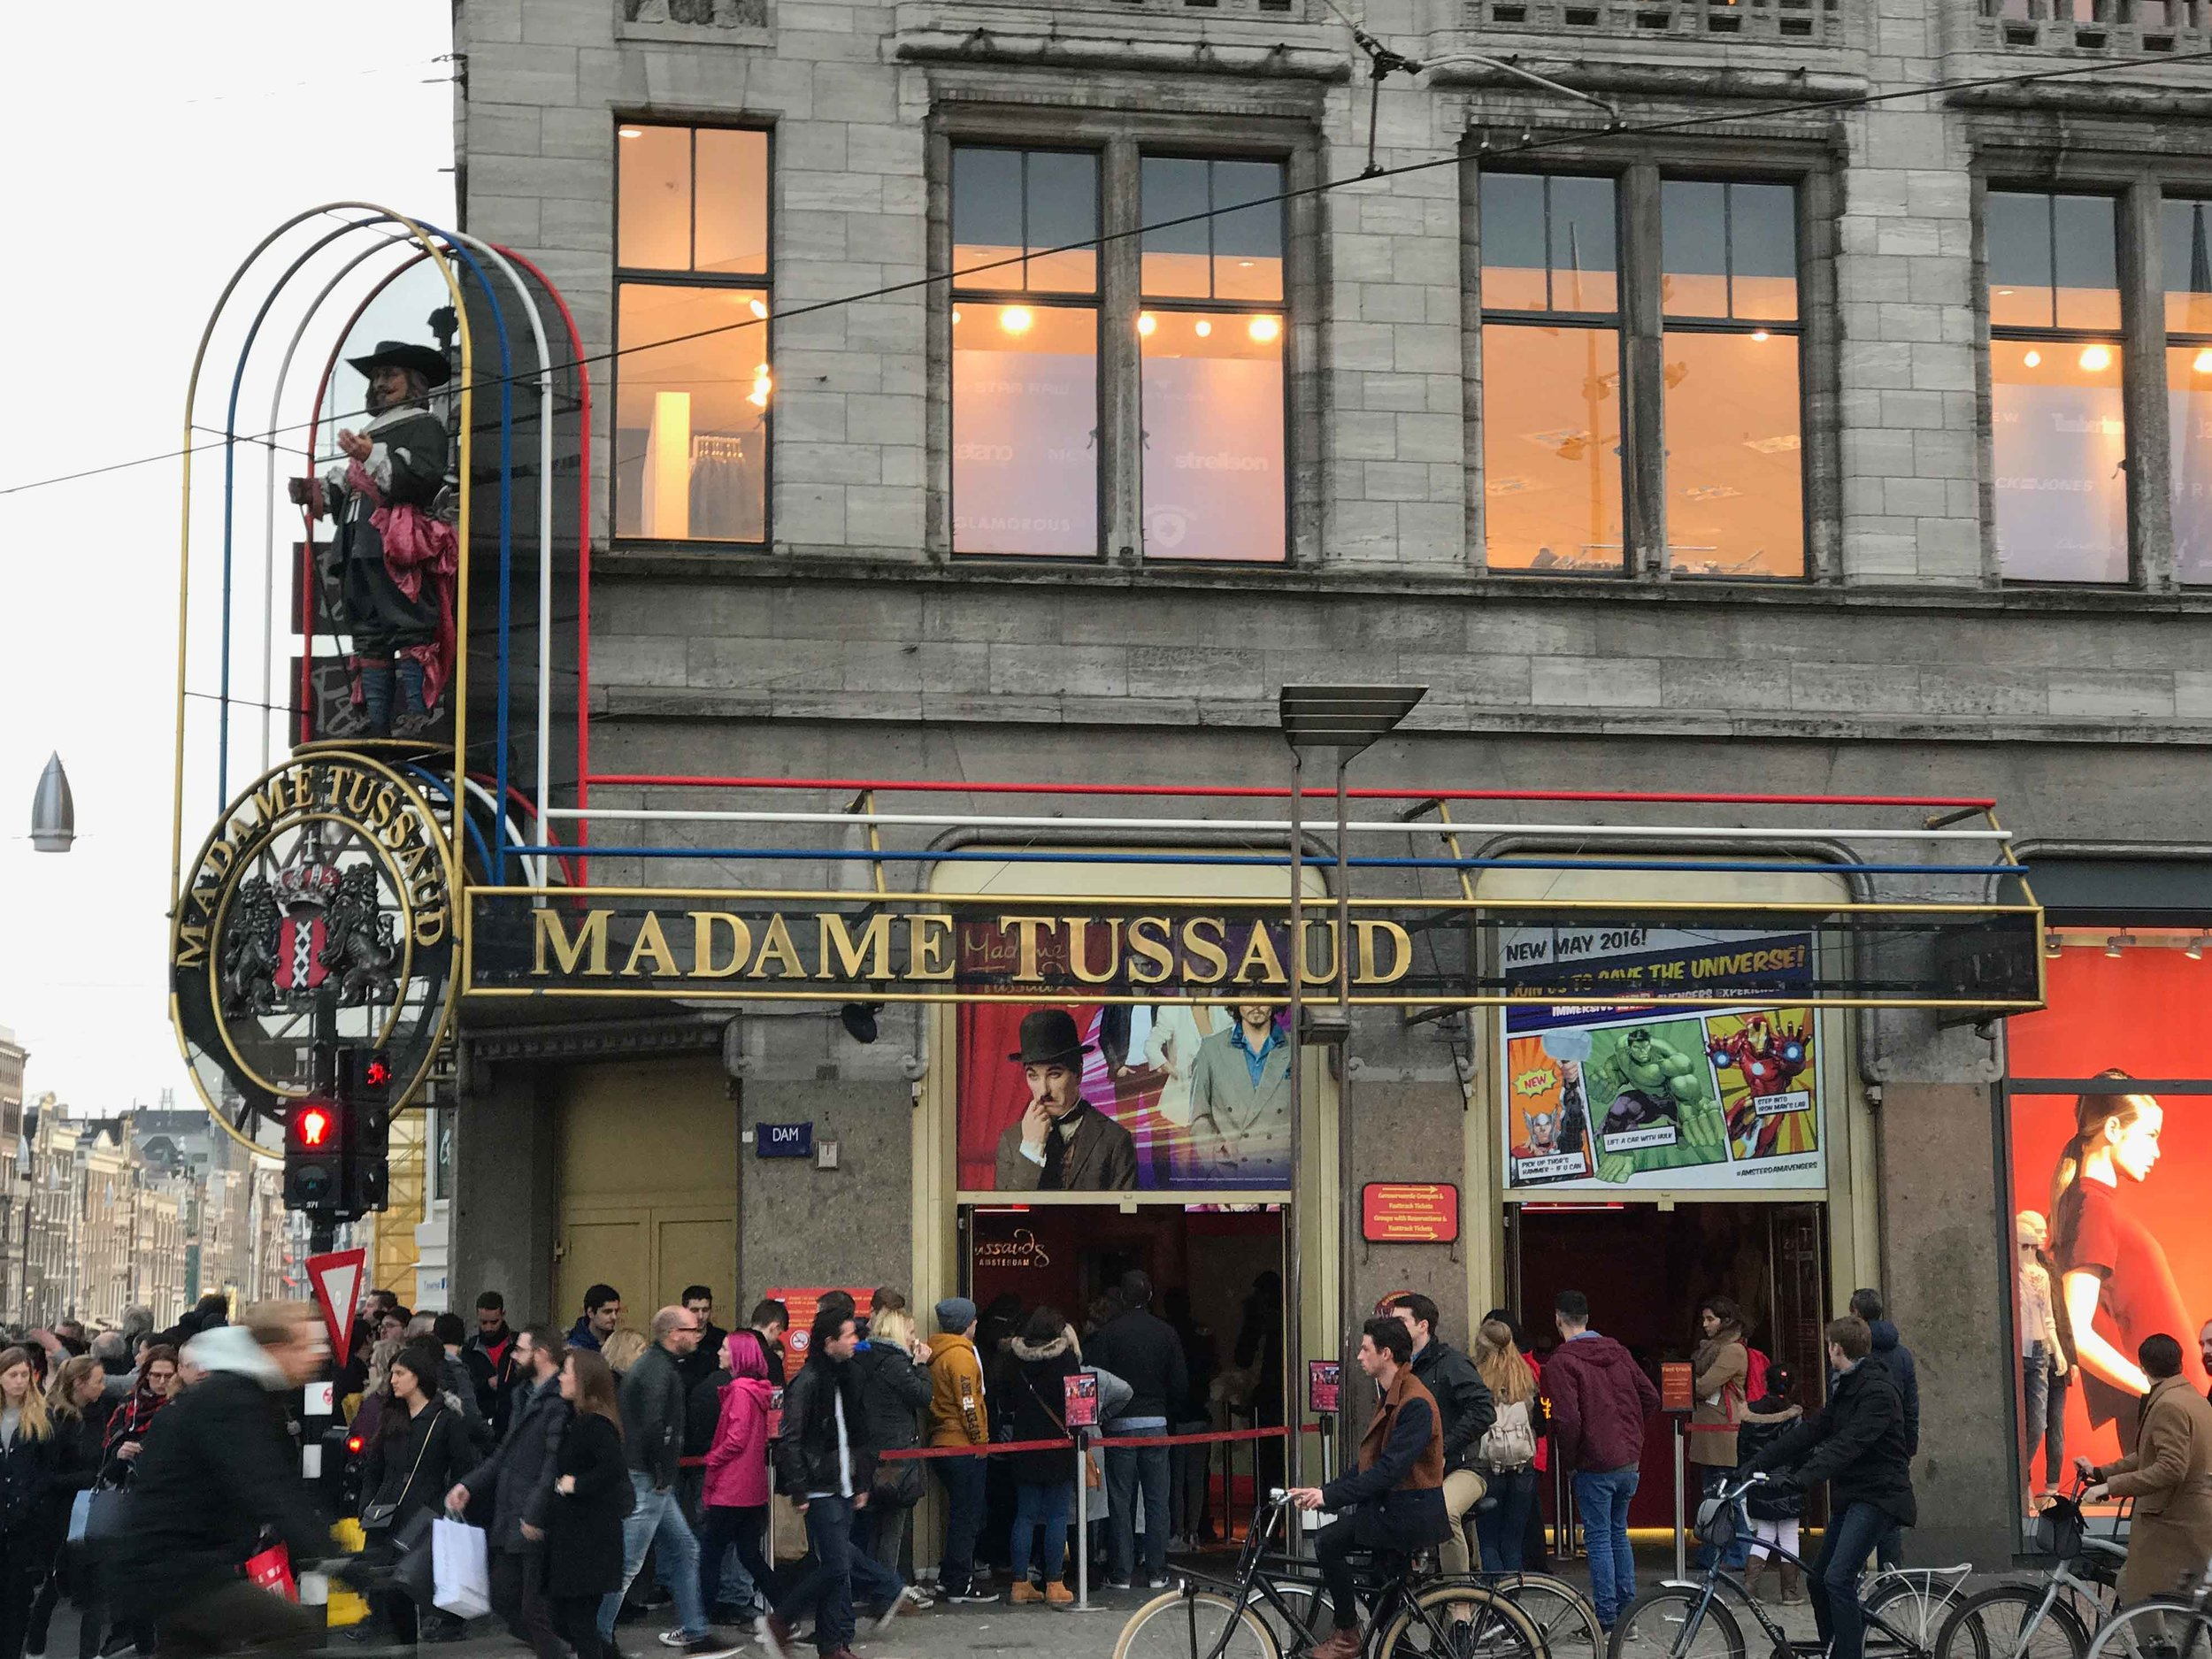 Madame Tussaud,Dam Square, Amsterdam. Photo: Gunjan Virk. Image©thingstodot.com